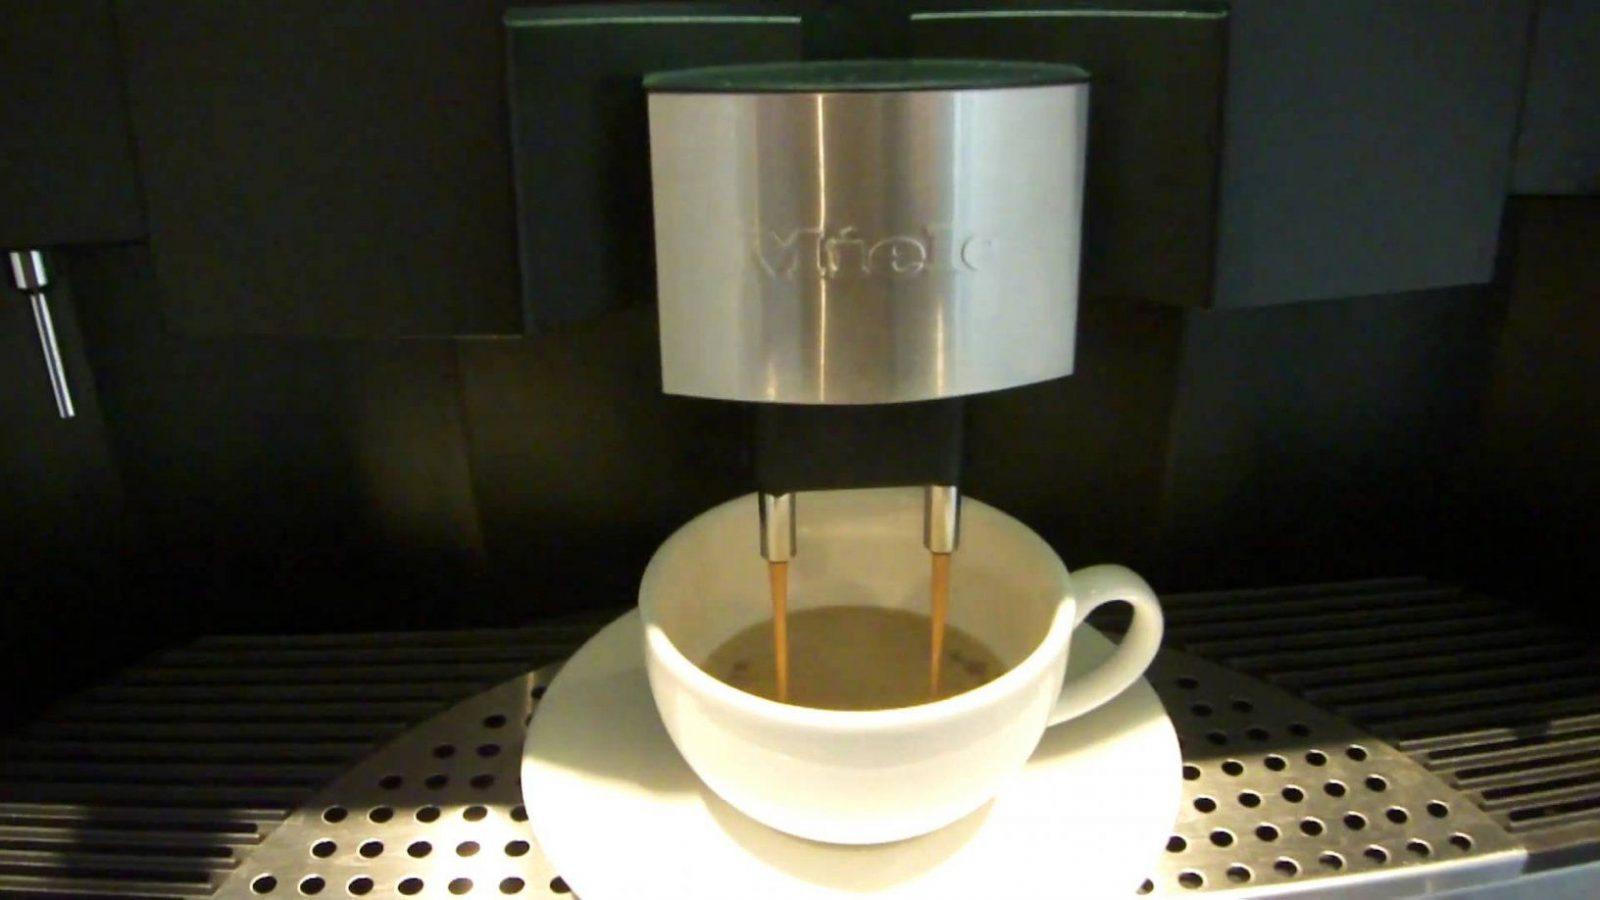 Miele Cva 6201 Making Coffee  Youtube von Miele Kaffeevollautomat Cva 620 Photo